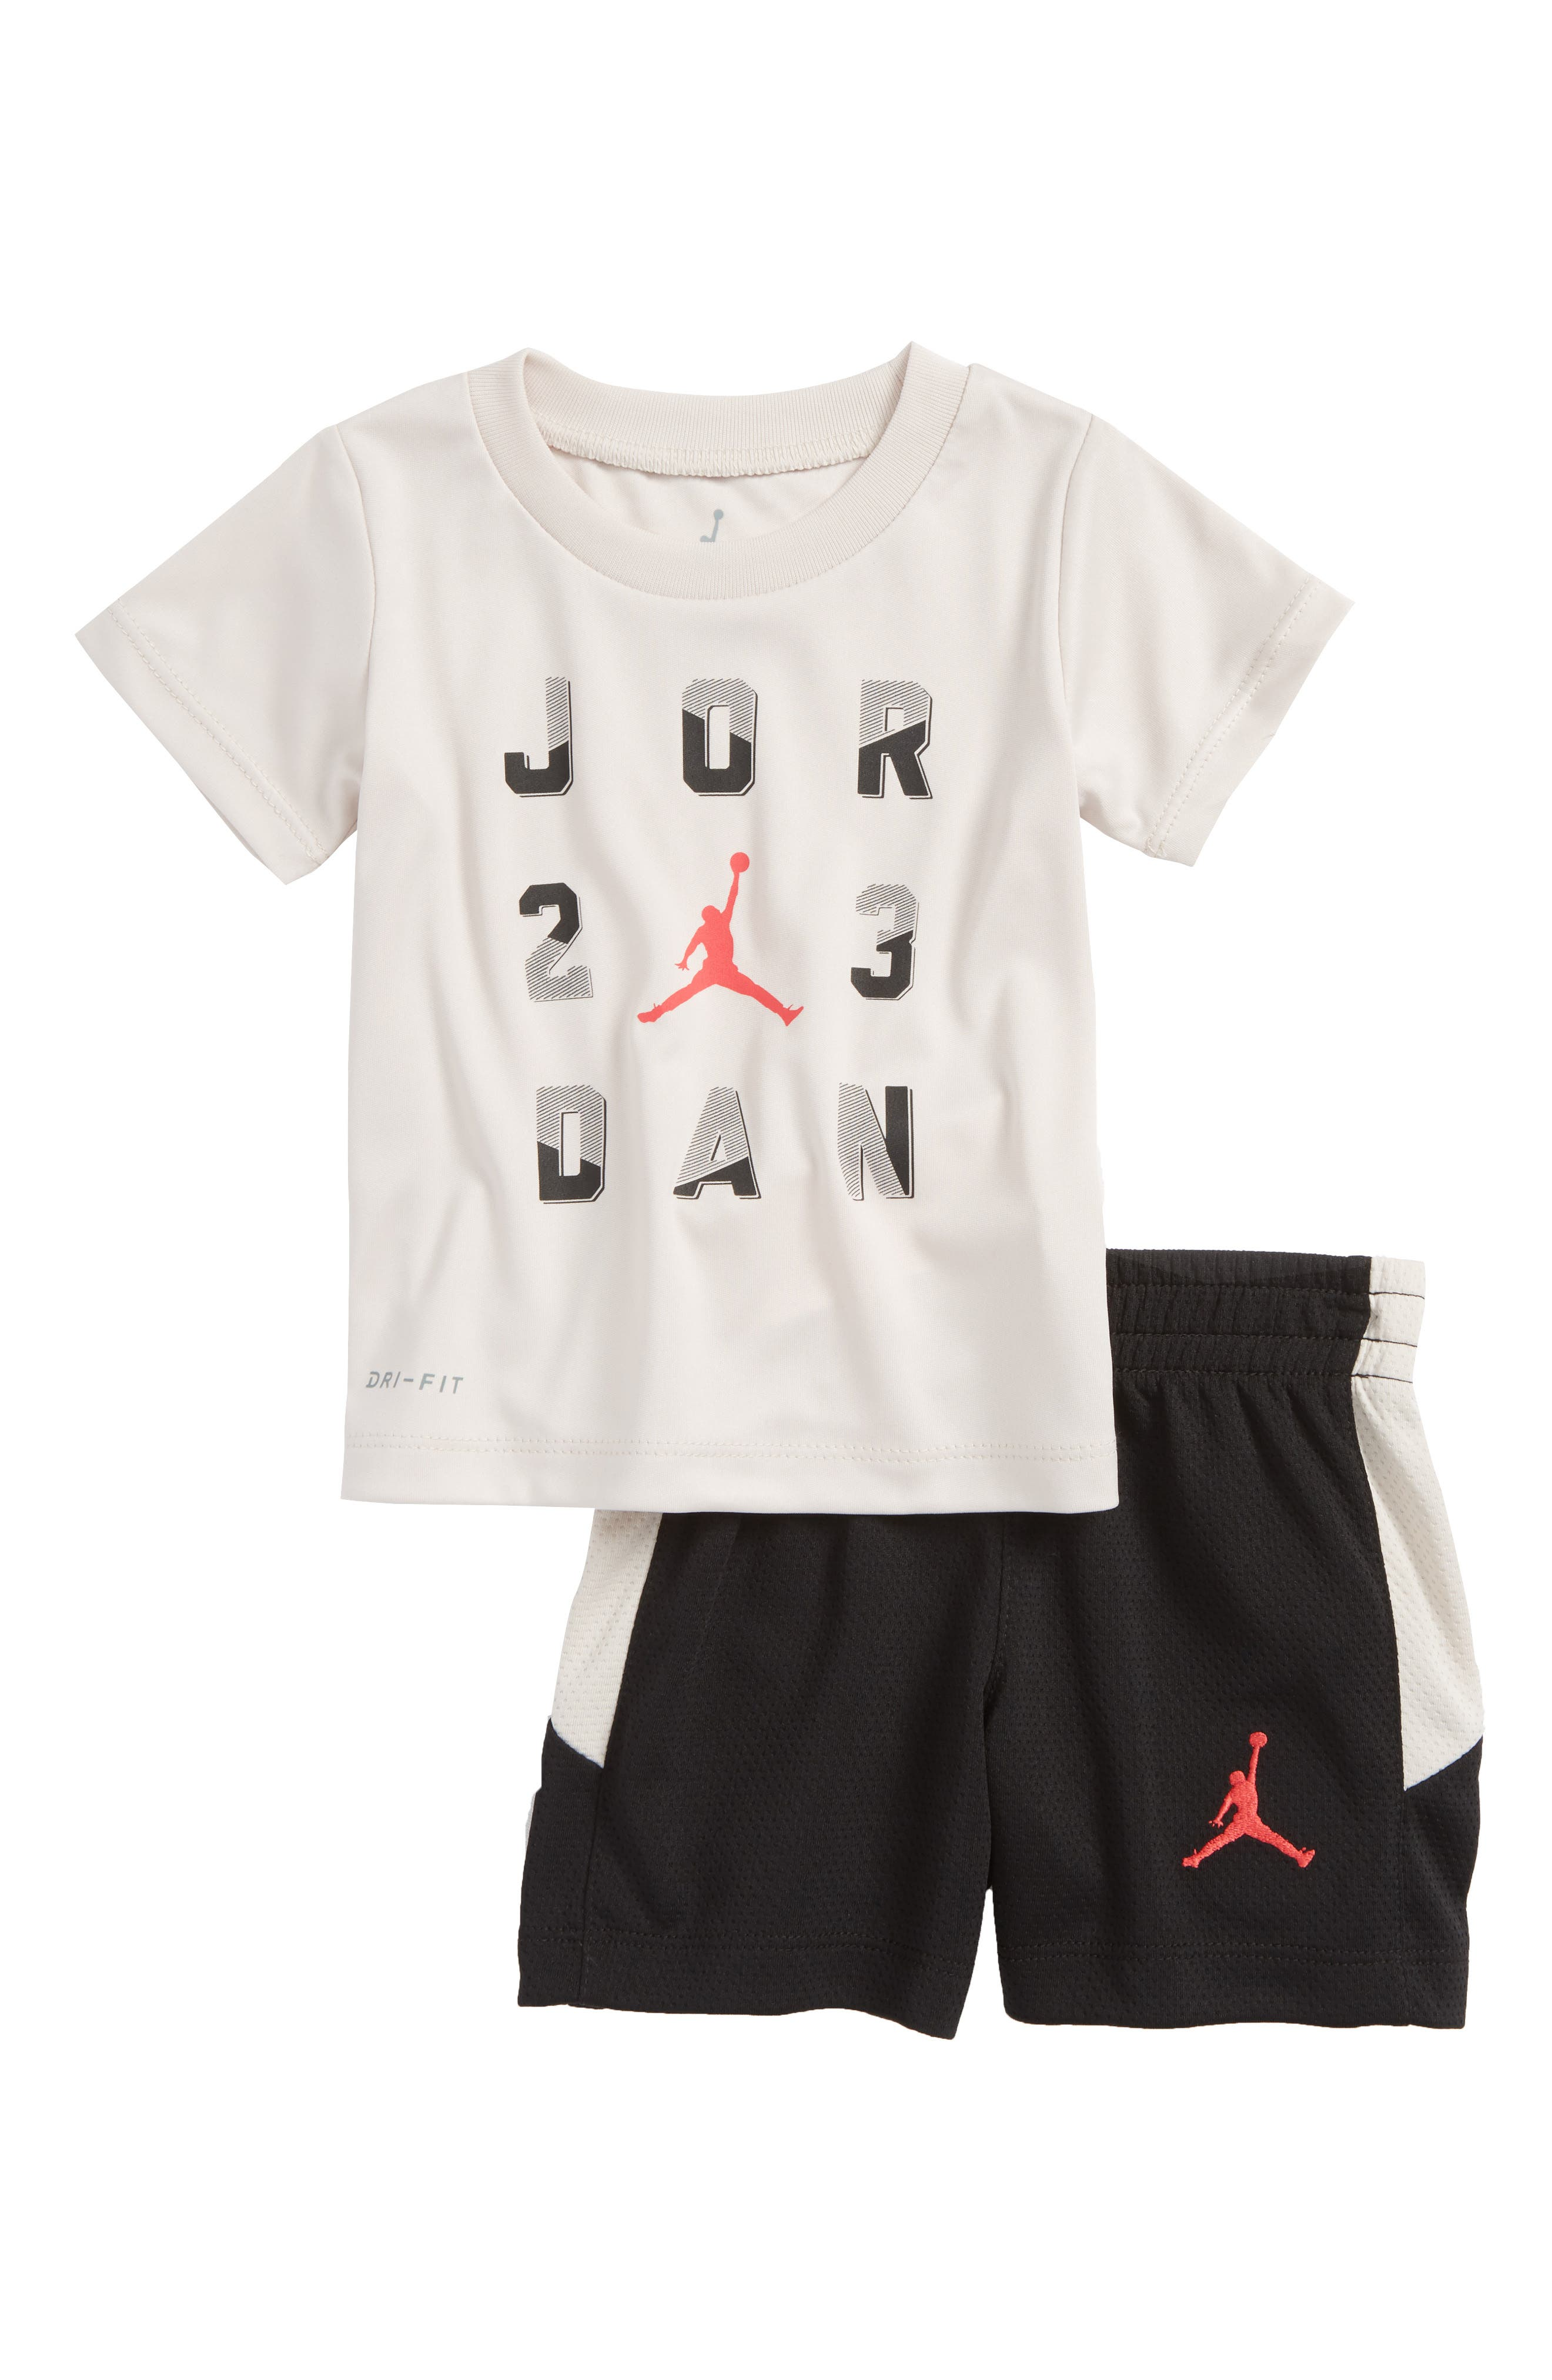 Alternate Image 1 Selected - Jordan 23 T-Shirt & Shorts Set (Baby Boys)